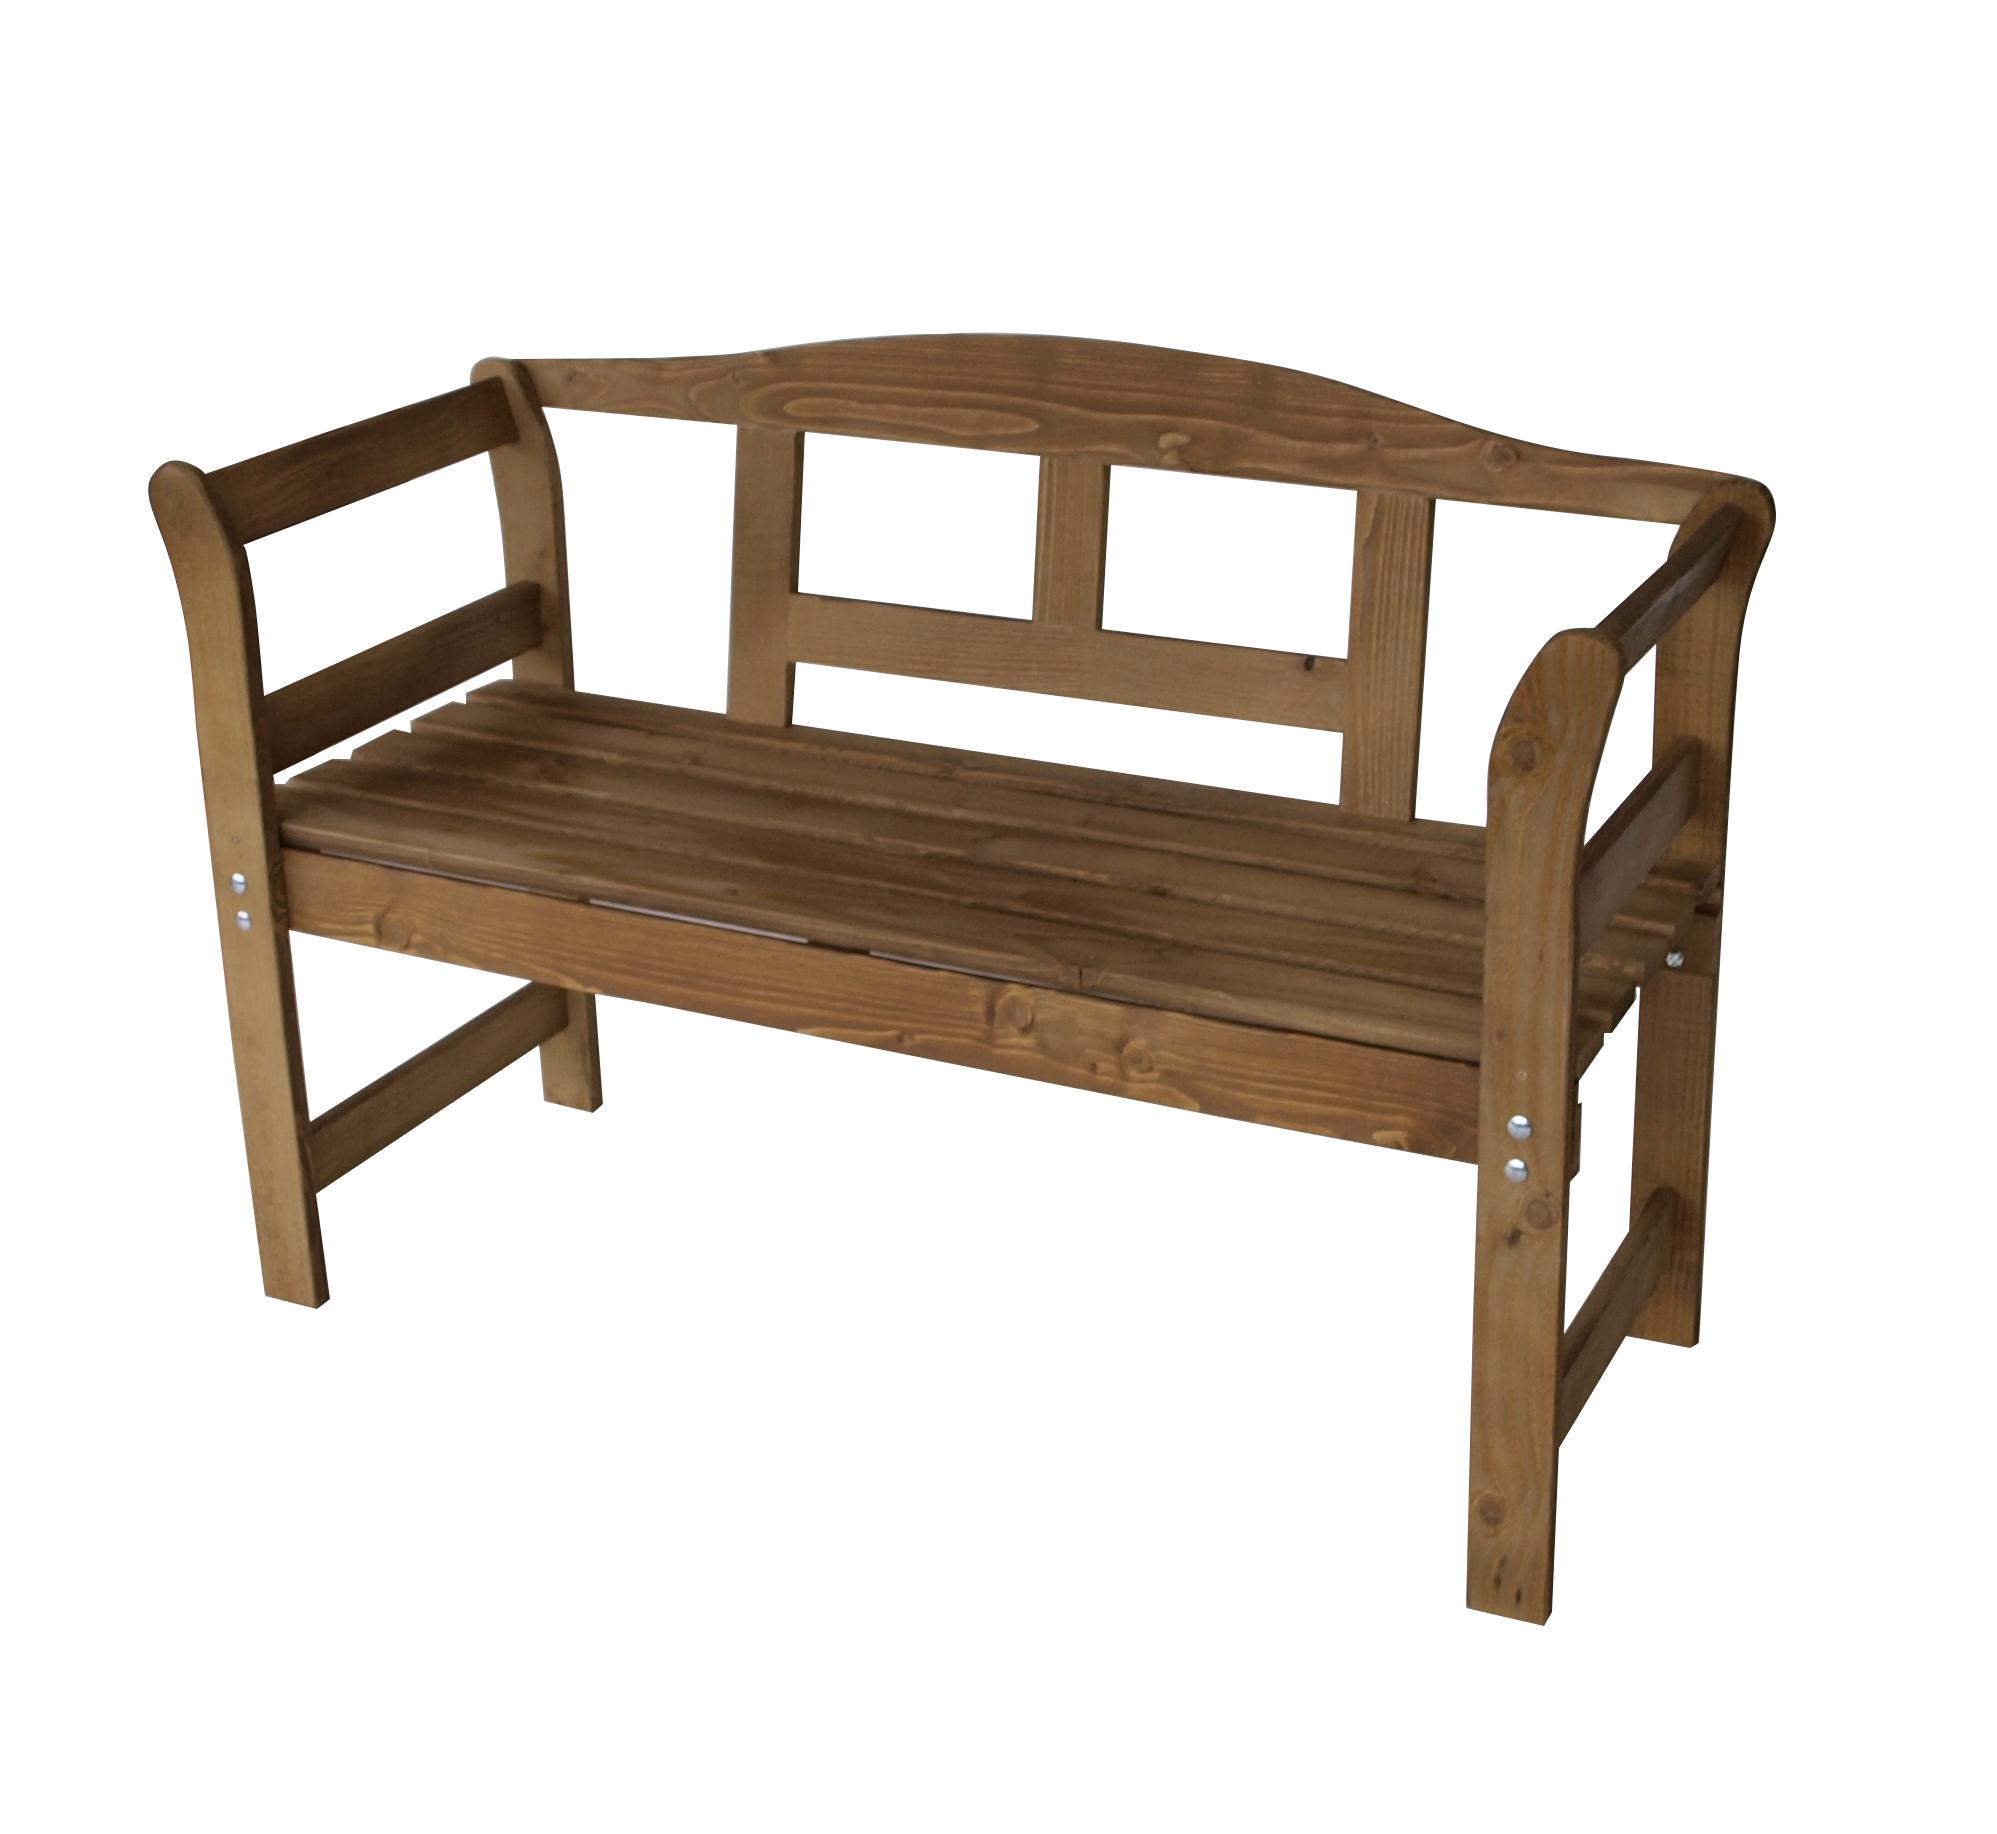 Obi Gartenmobel Pacora : Rustikale 2 Sitzer Holz Gartenbank Exotisch Gb323 2 Jpg Pictures to